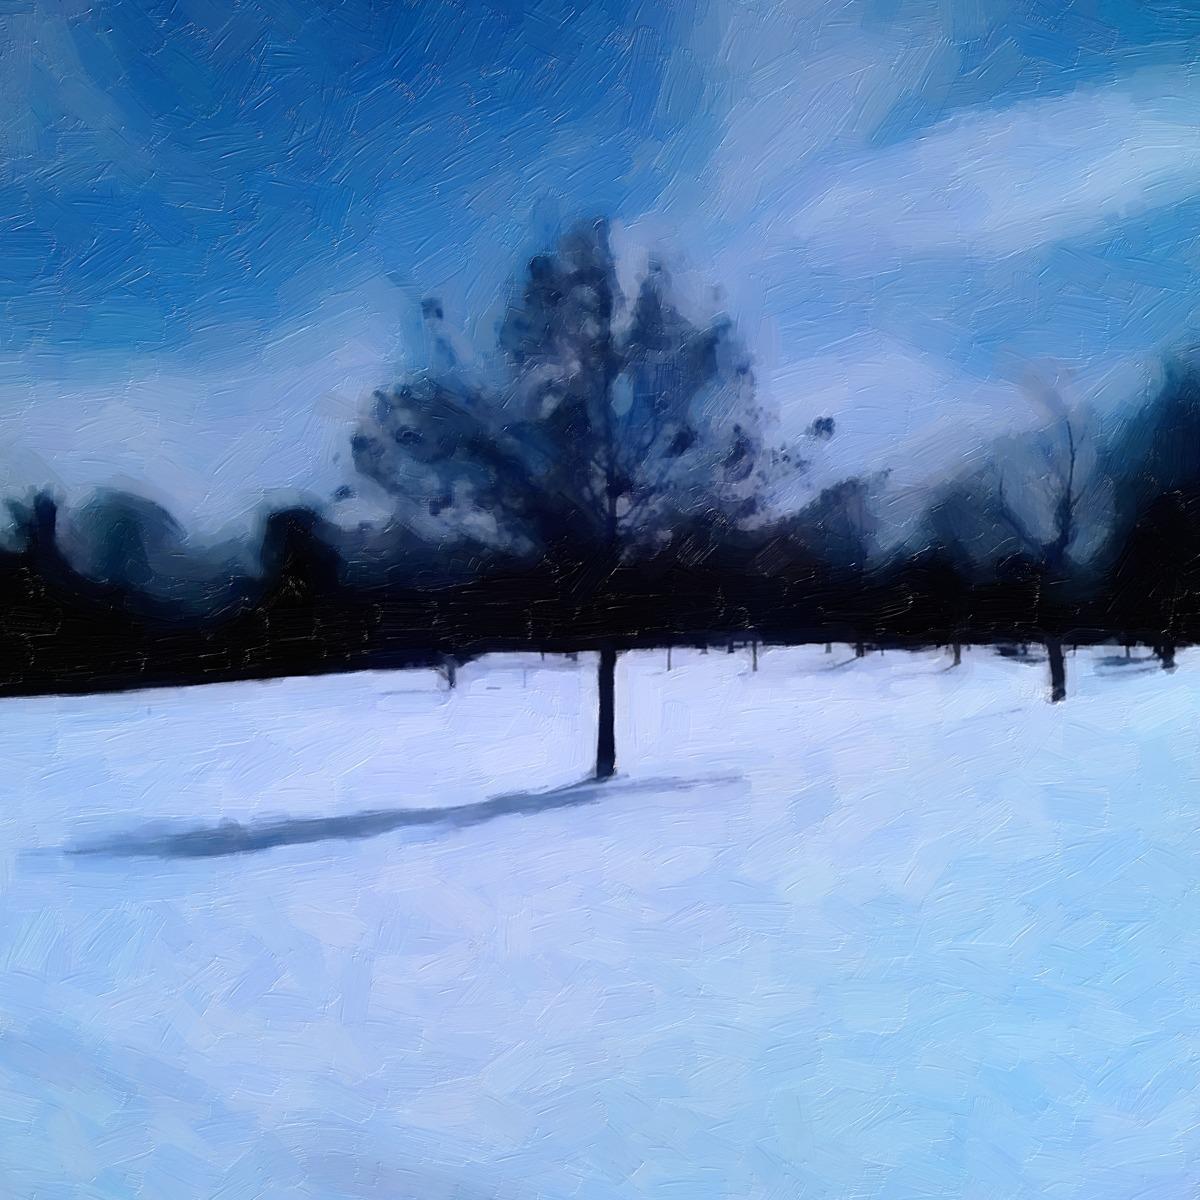 SNOW TREE (large view)